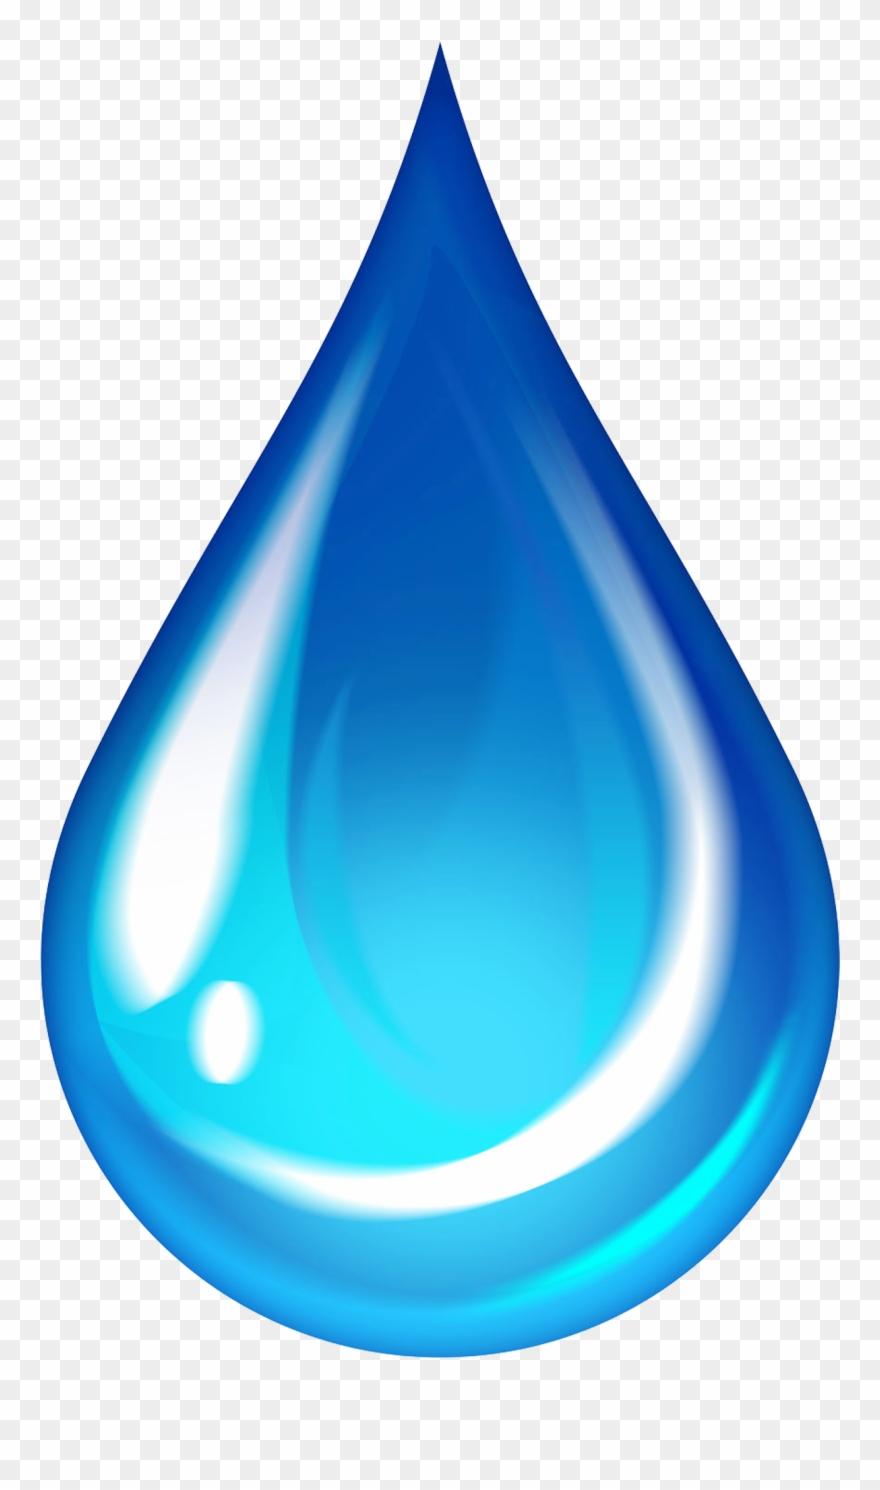 Water Drop Symbol Clipart Best Kmtqp4 Clipart.